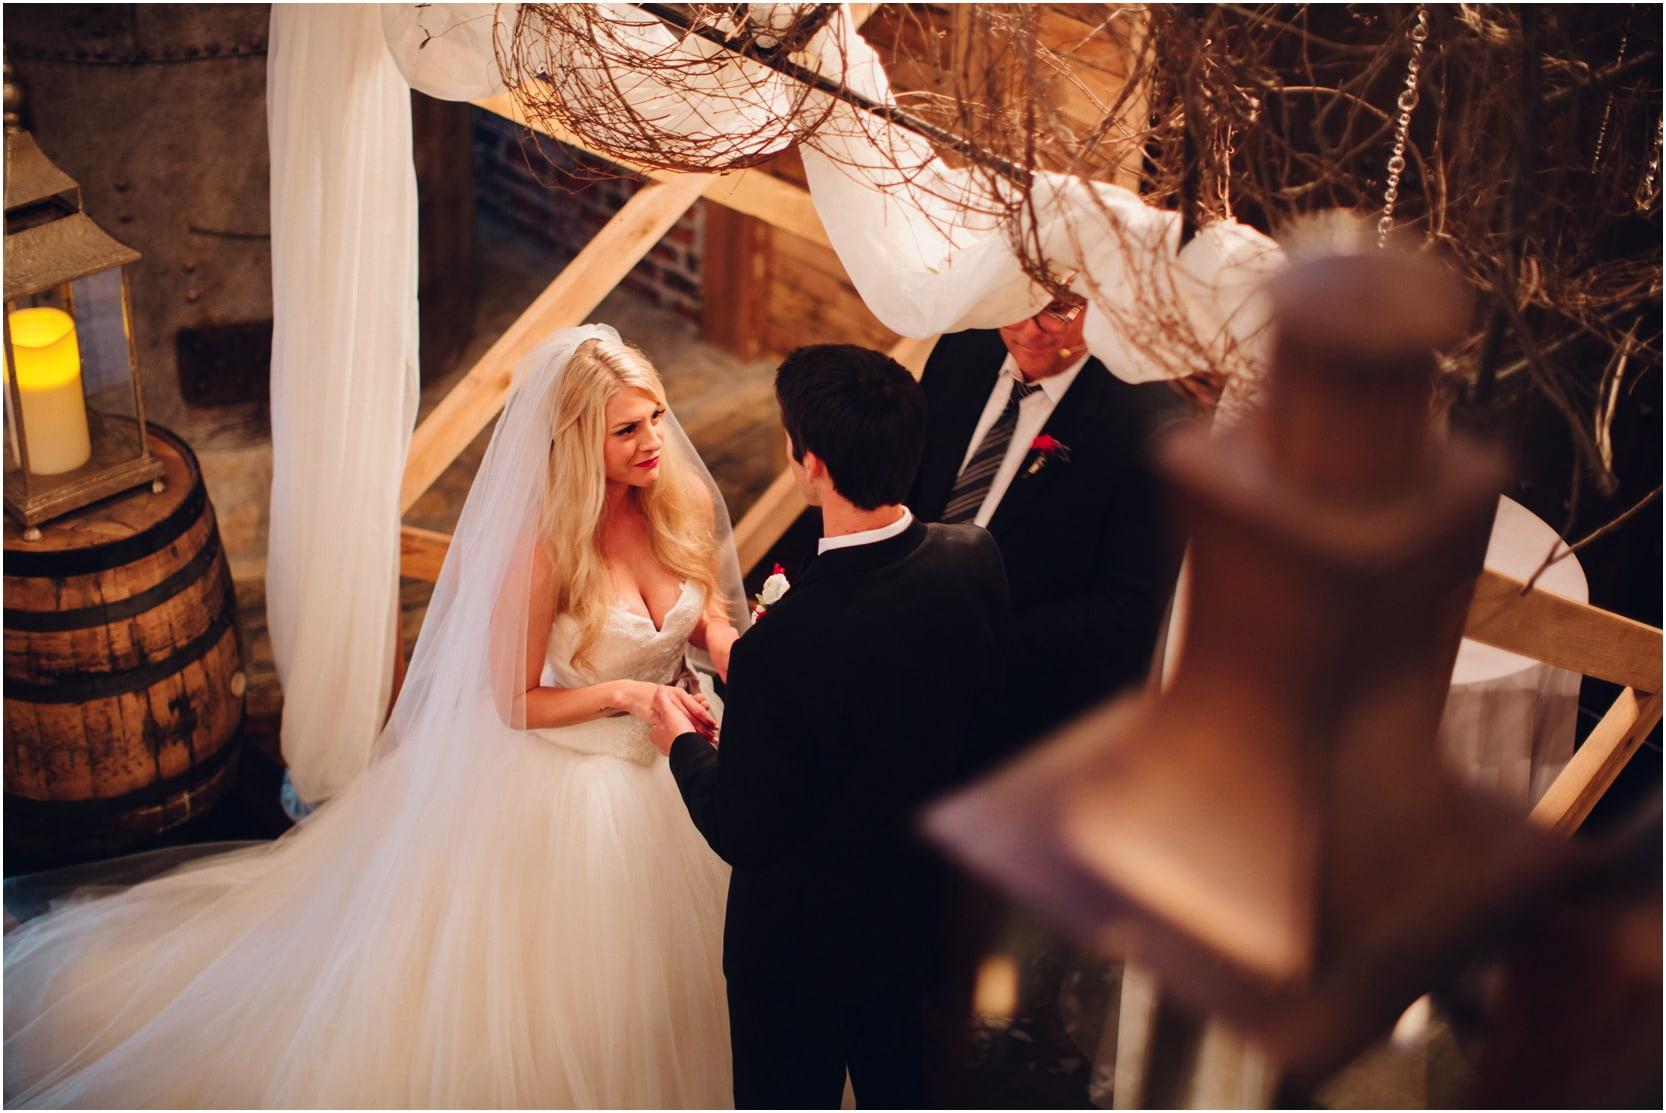 coderhillengburg_oklahoma_wedding__639_blogstomped